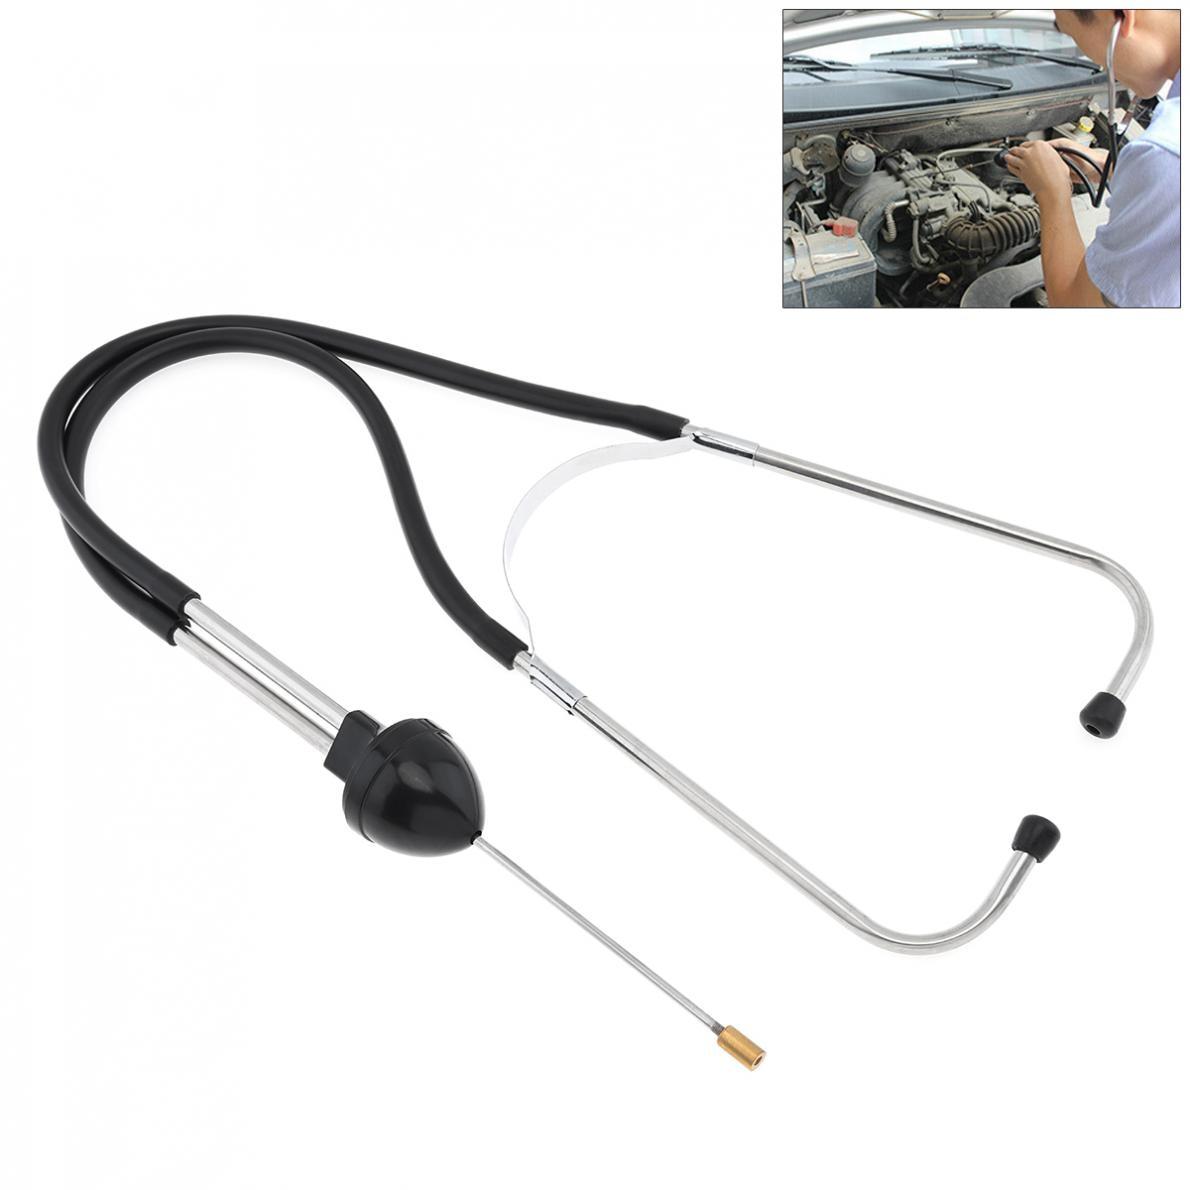 Auto Auto Diagnose Werkzeuge Motorblock Stethoskop Automotive Detektor Mechanik Tester Werkzeuge Motor Analysator